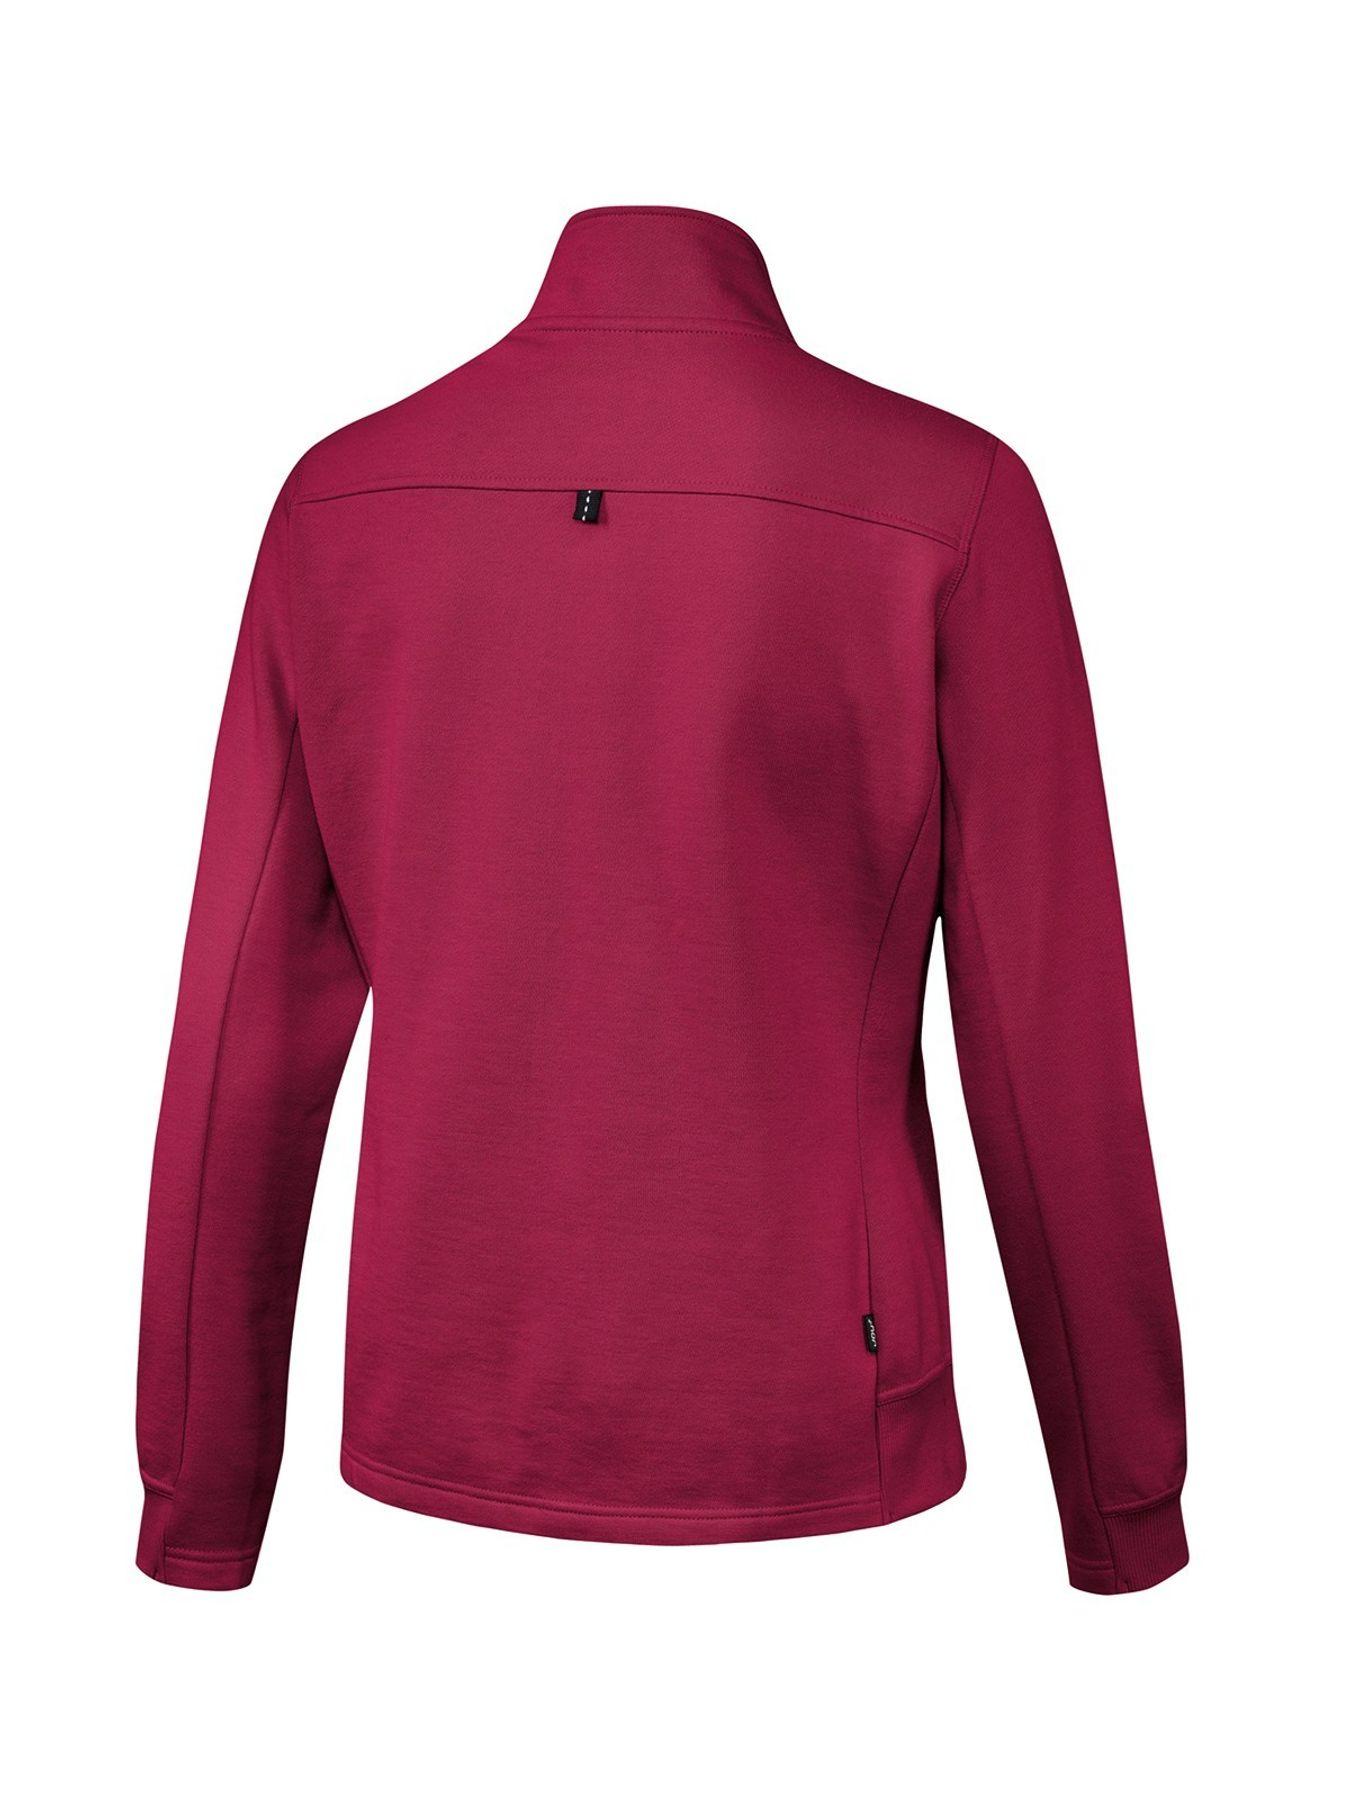 Joy - Damen Sport und Freizeit Jacke in mehreren Farben, Paulina (34500) – Bild 18